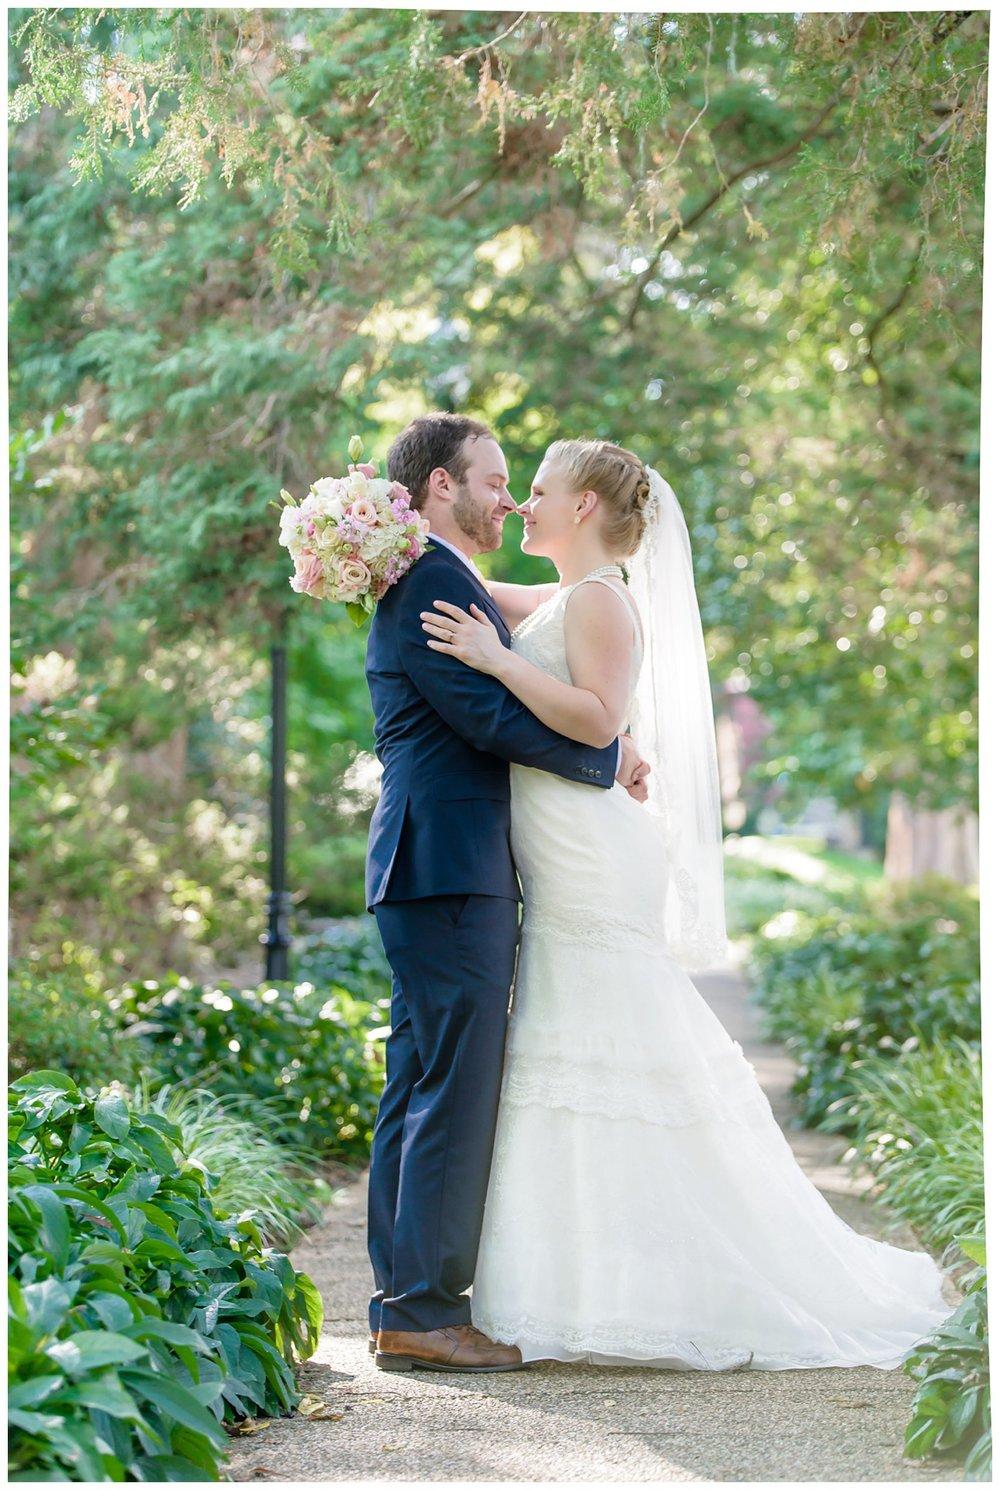 Della and Andrew Wedding Photos_Hendry House Arlington Virginia_Stephanie Kopf Photography_Northern Virginia Wedding Photography-80.jpg